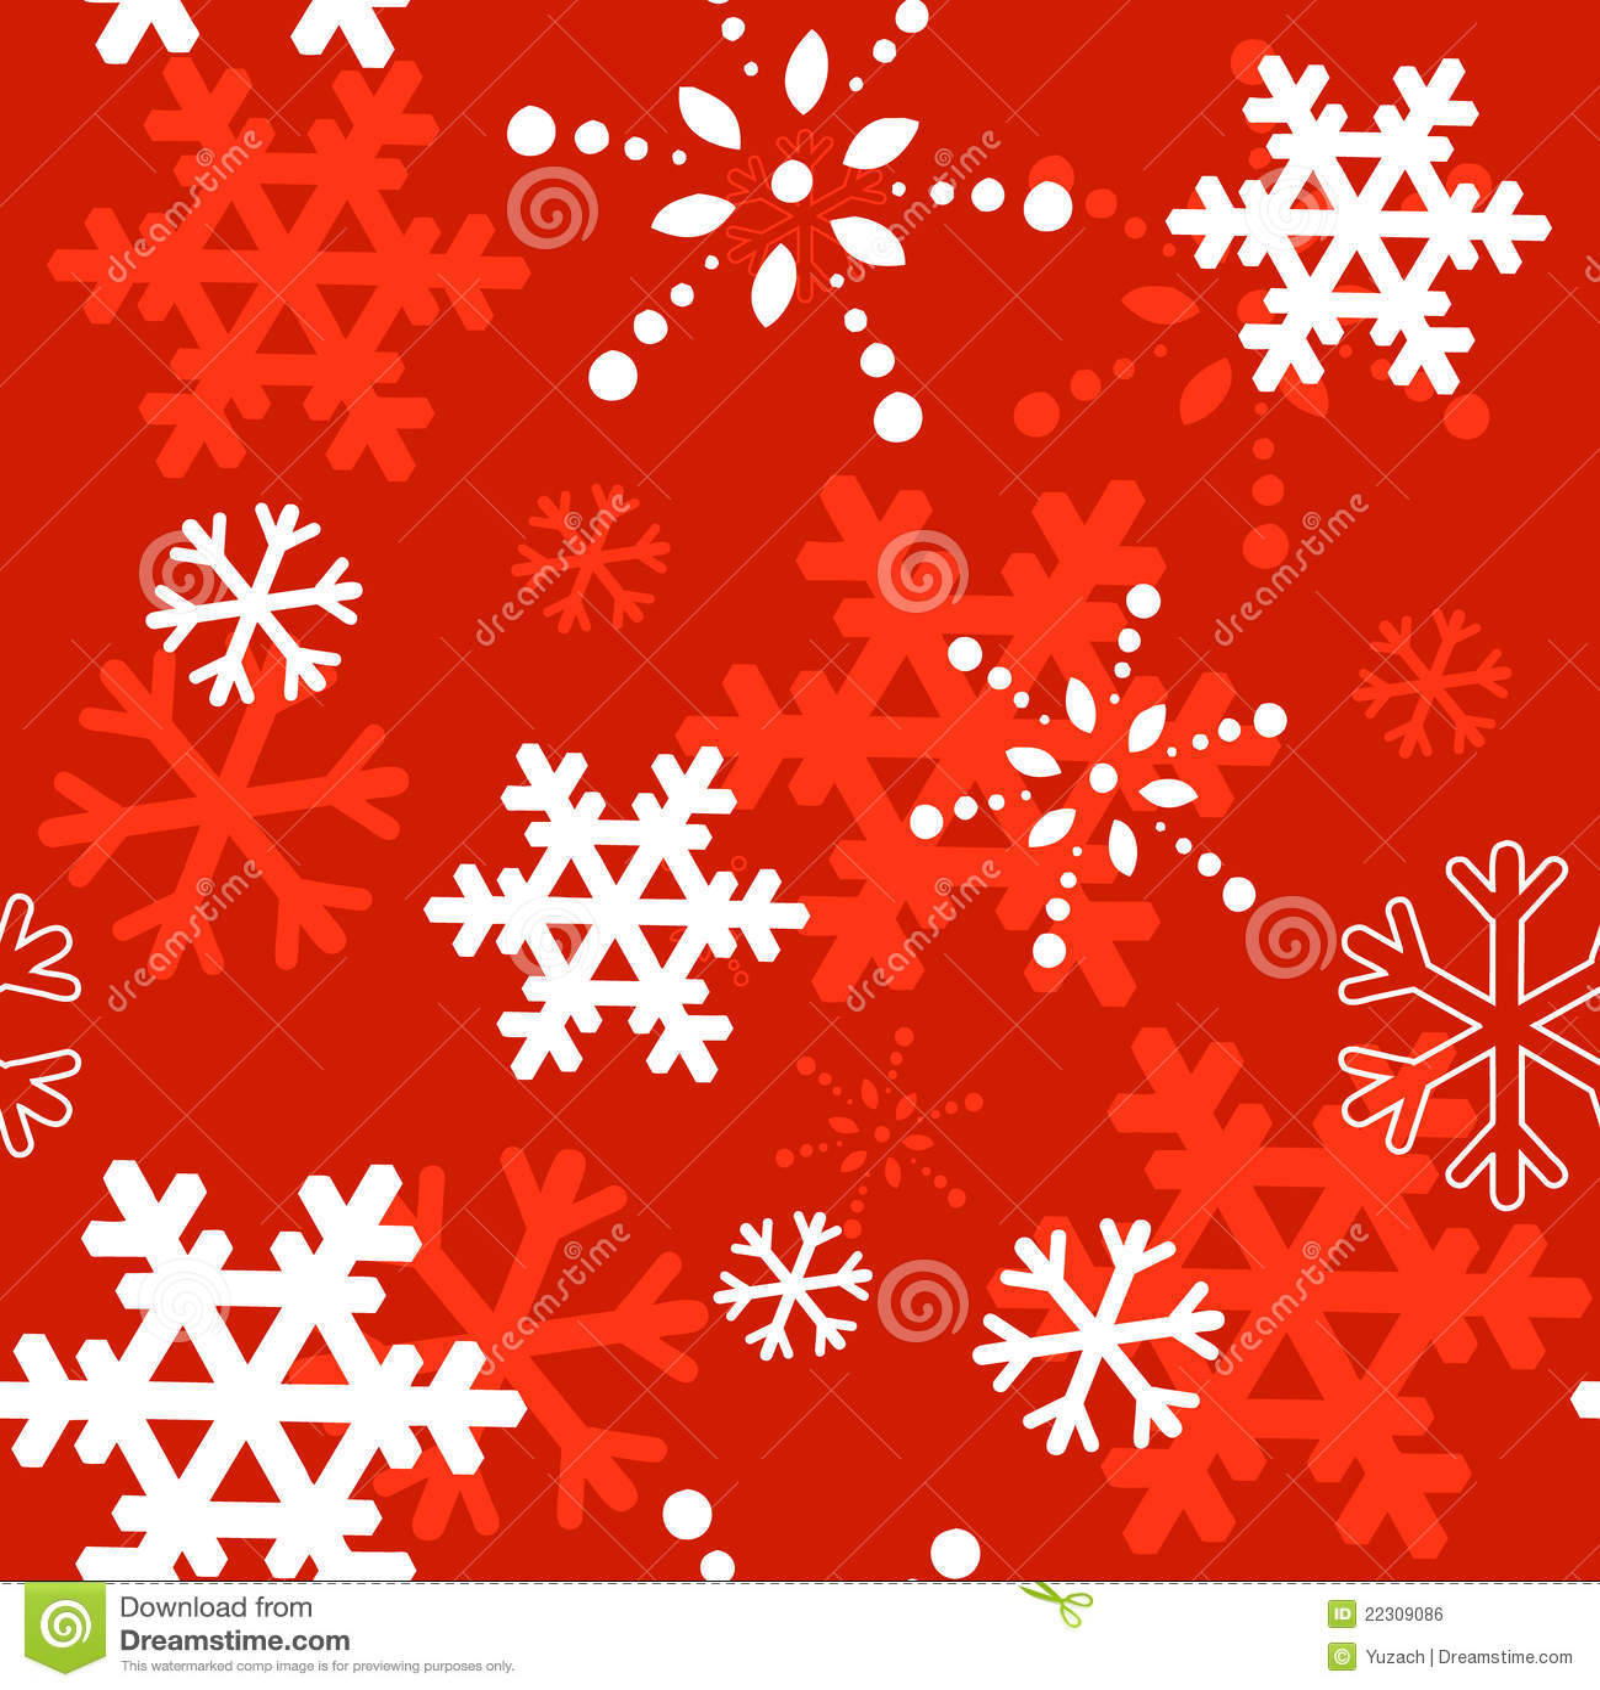 Christmas Texture.Decorative Winter Christmas Seamless Texture Stock Vector